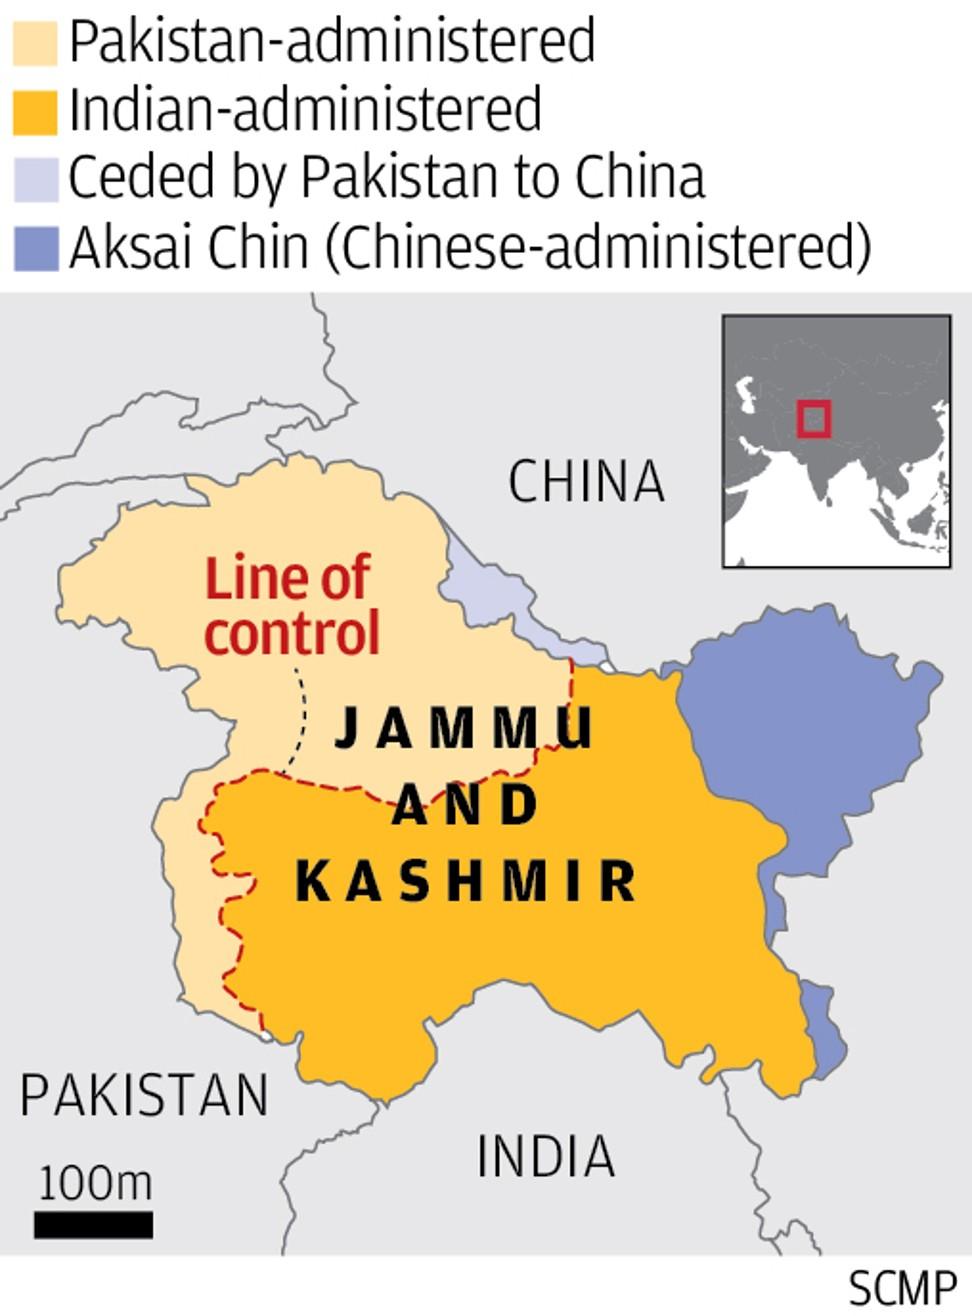 Militants kill Kashmir BJP politician Gul Mohammad Mir as next India